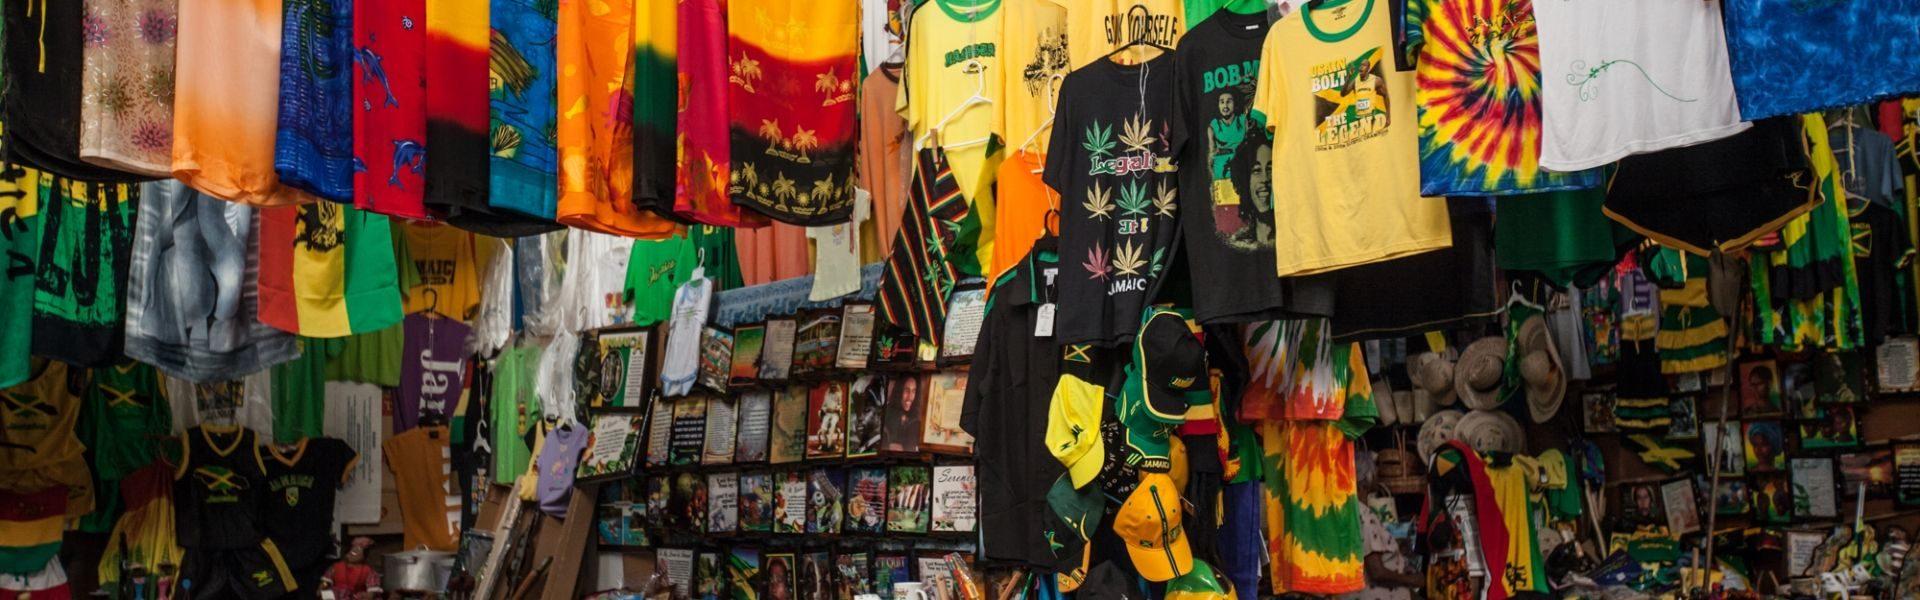 Montreal's Reggae Station